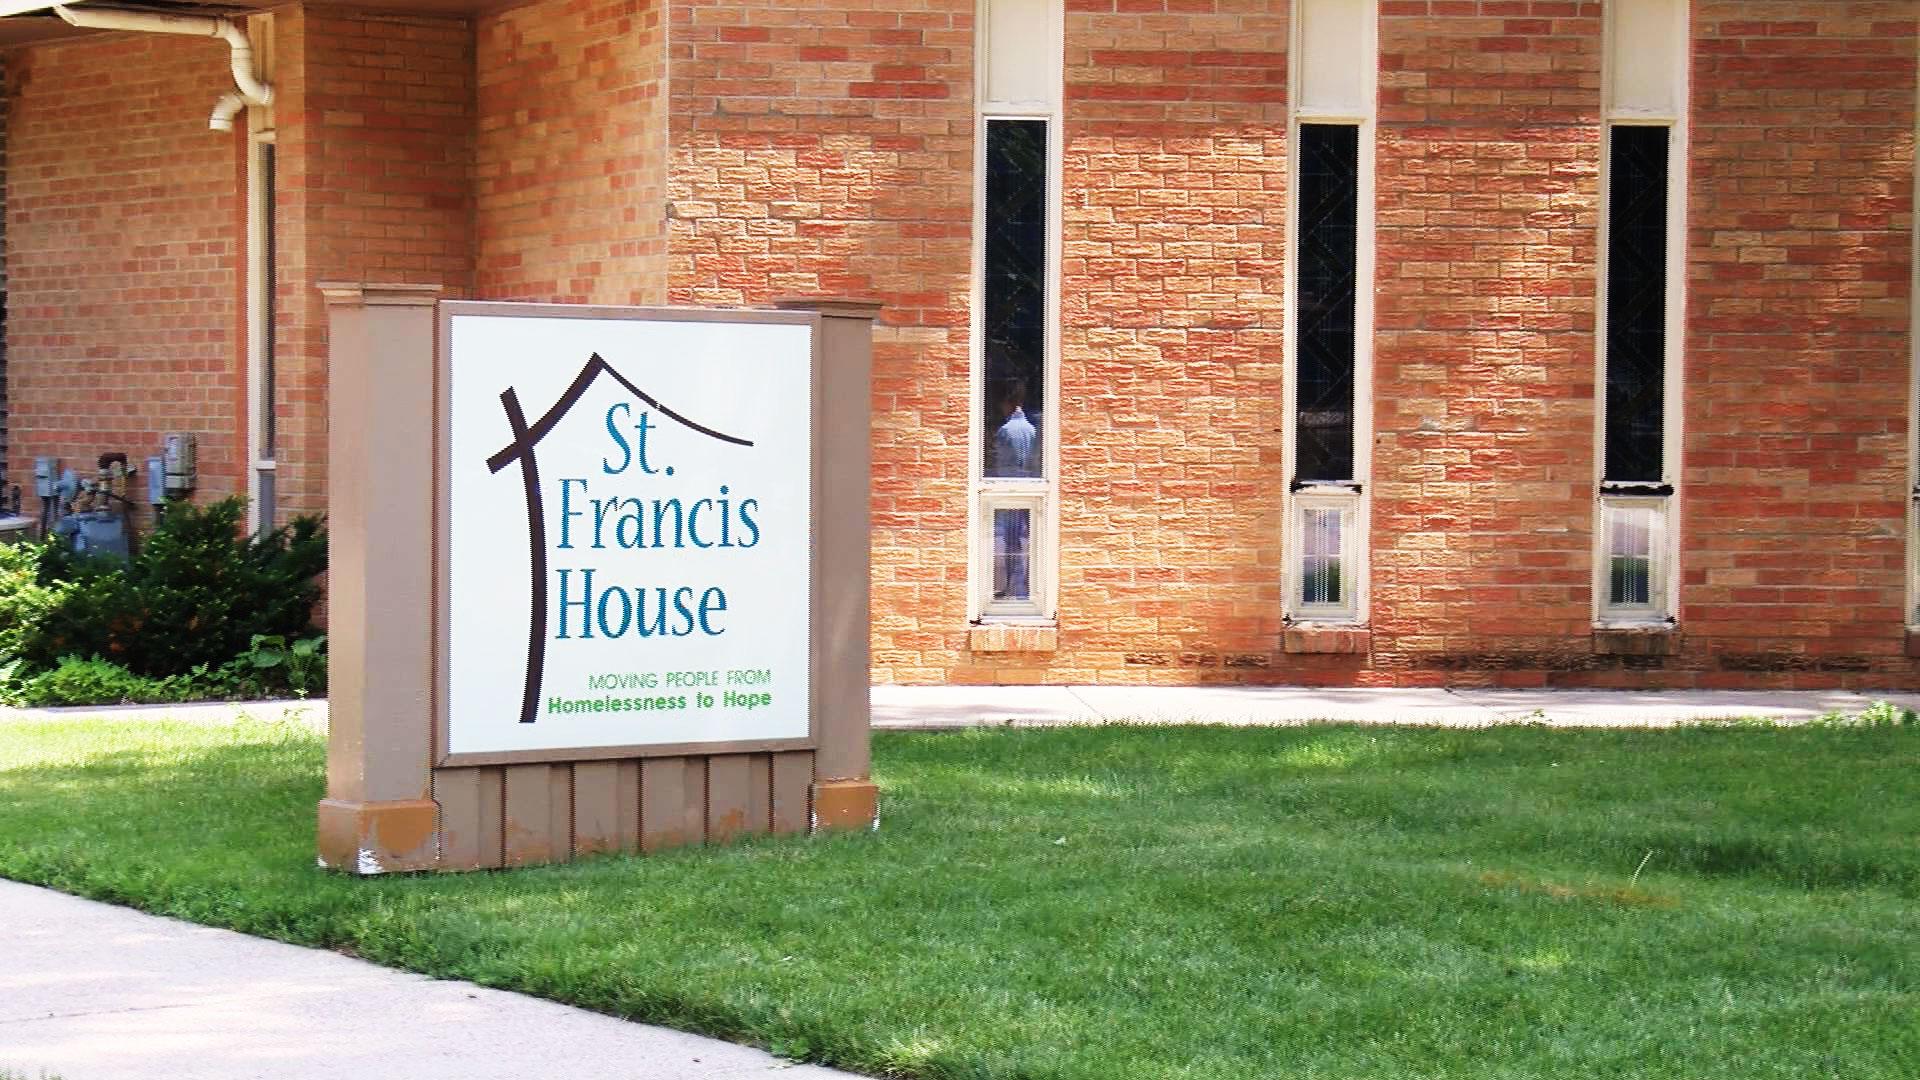 KELO St. Francis House